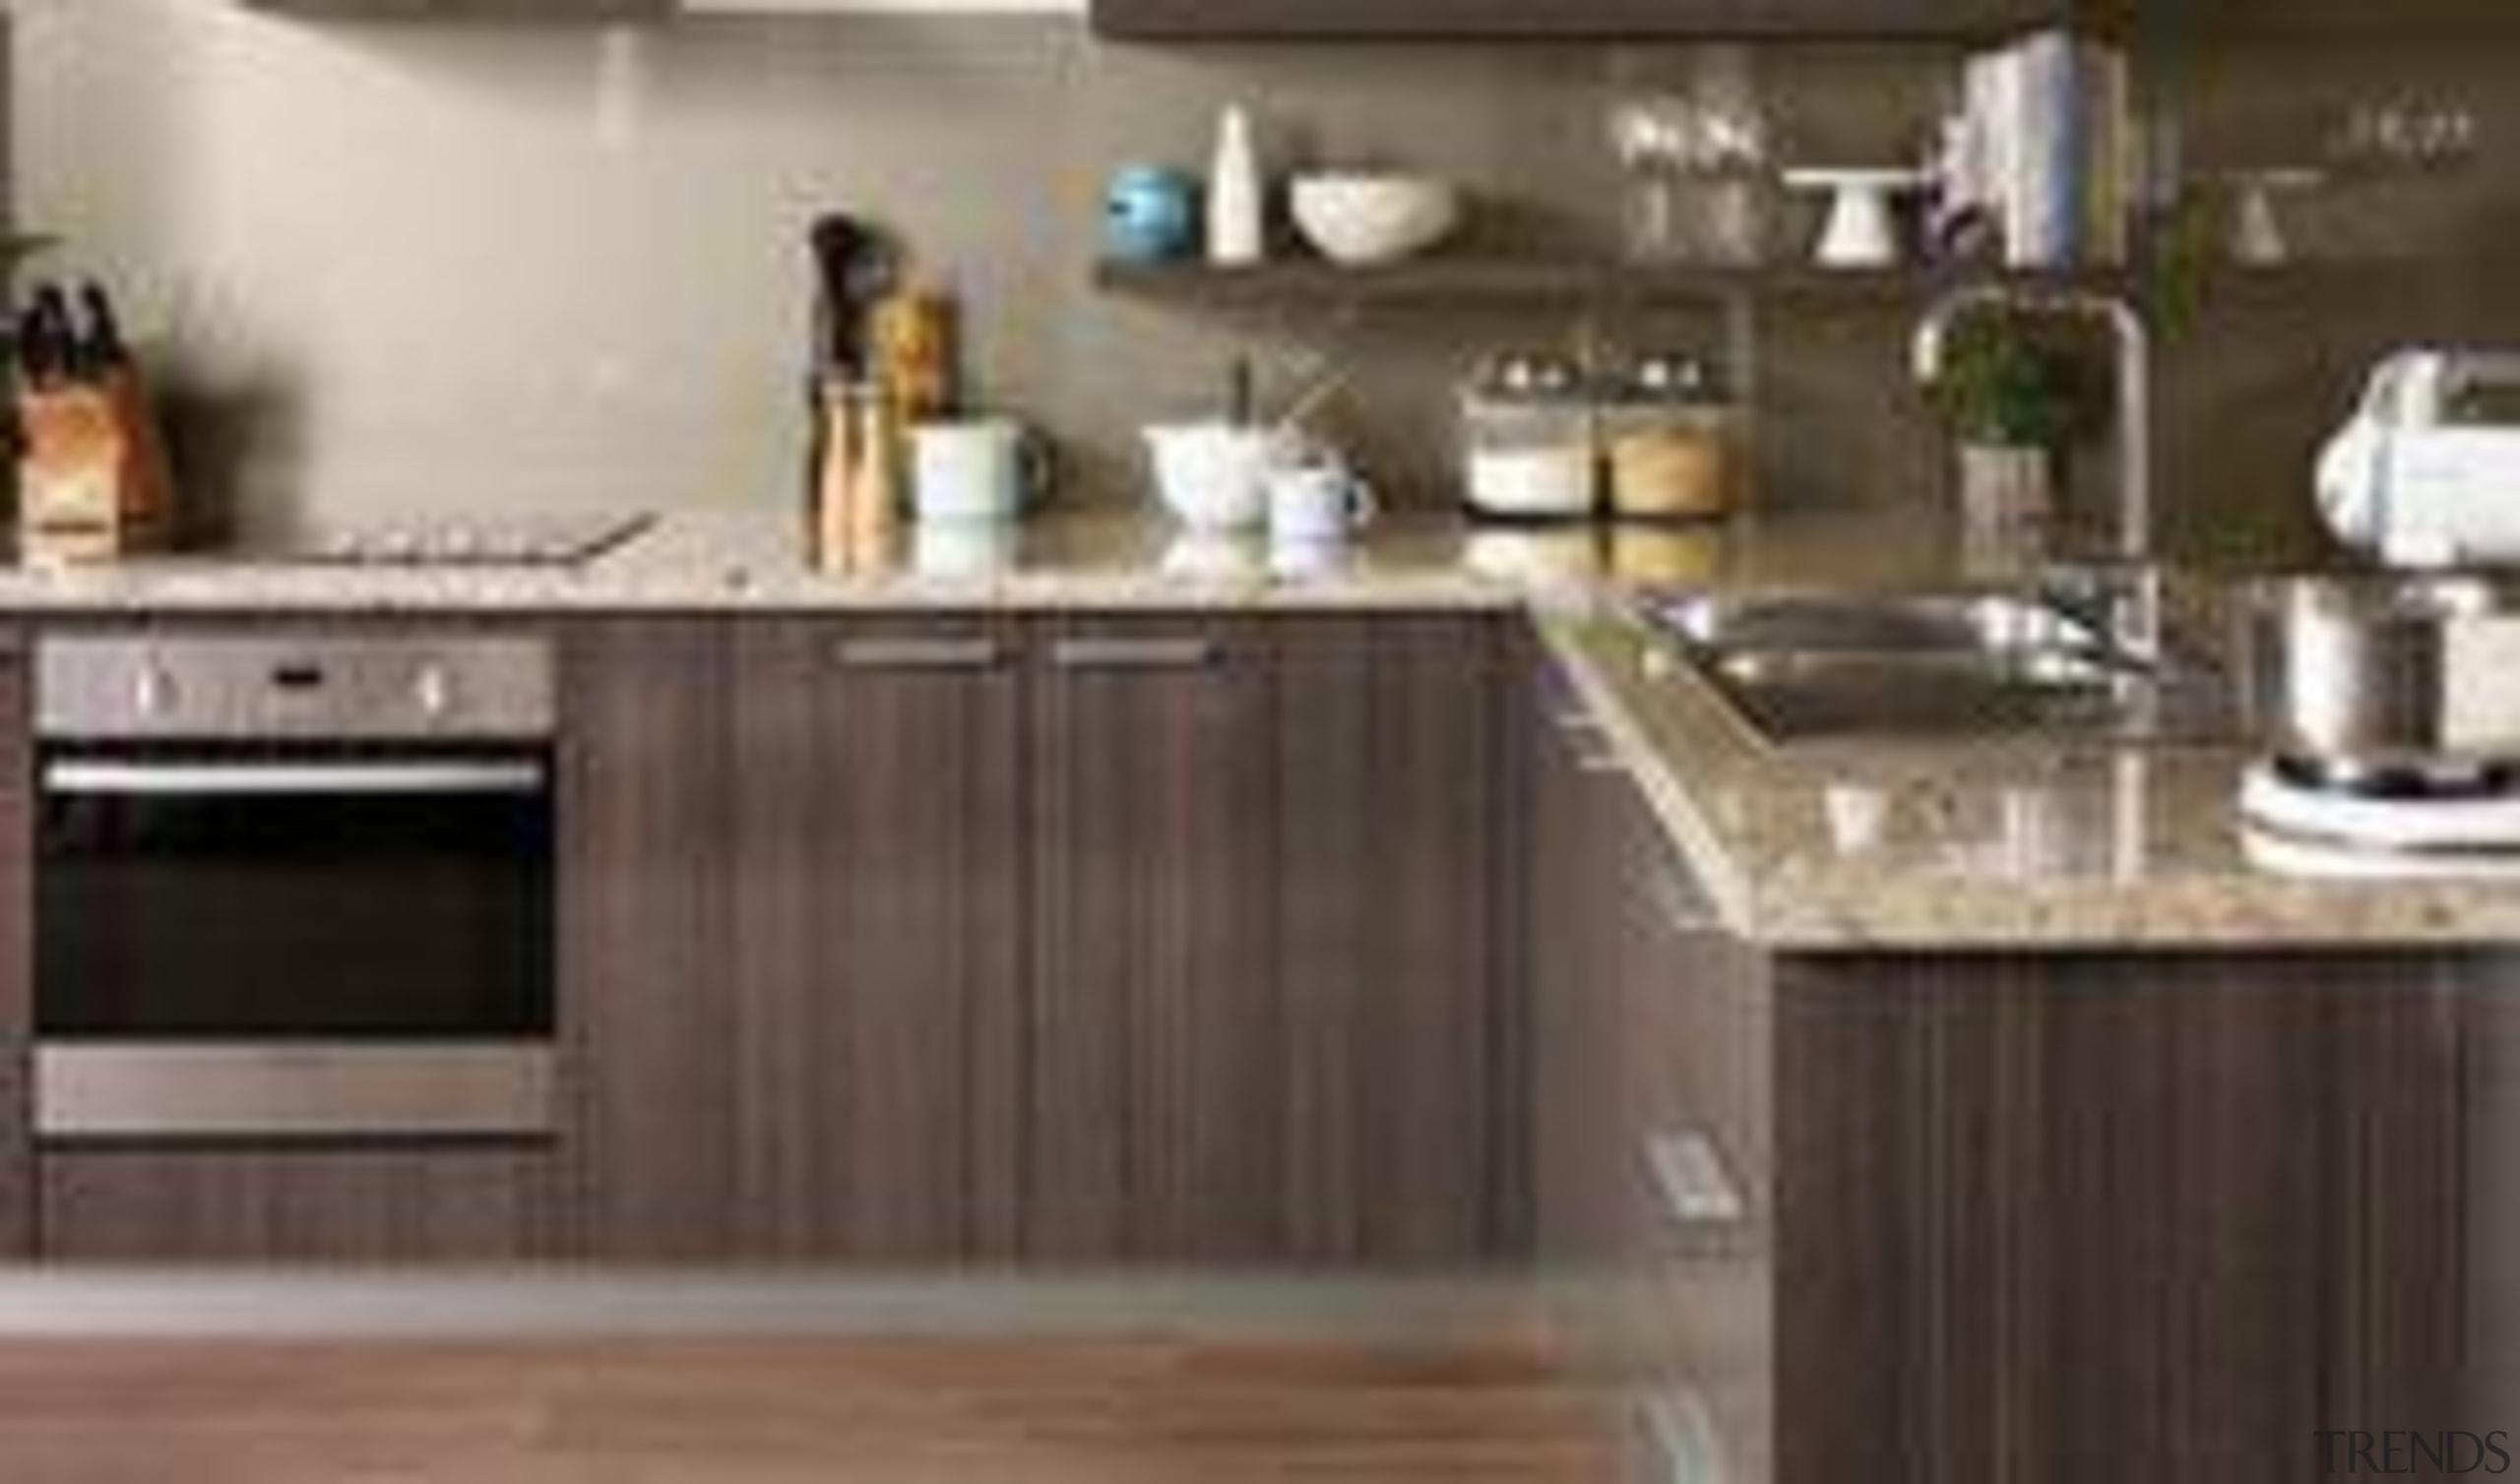 My Dream Kitchen : Inspiration Gallery : Gloss cabinetry, countertop, cuisine classique, hardwood, home appliance, interior design, kitchen, kitchen appliance, gray, brown